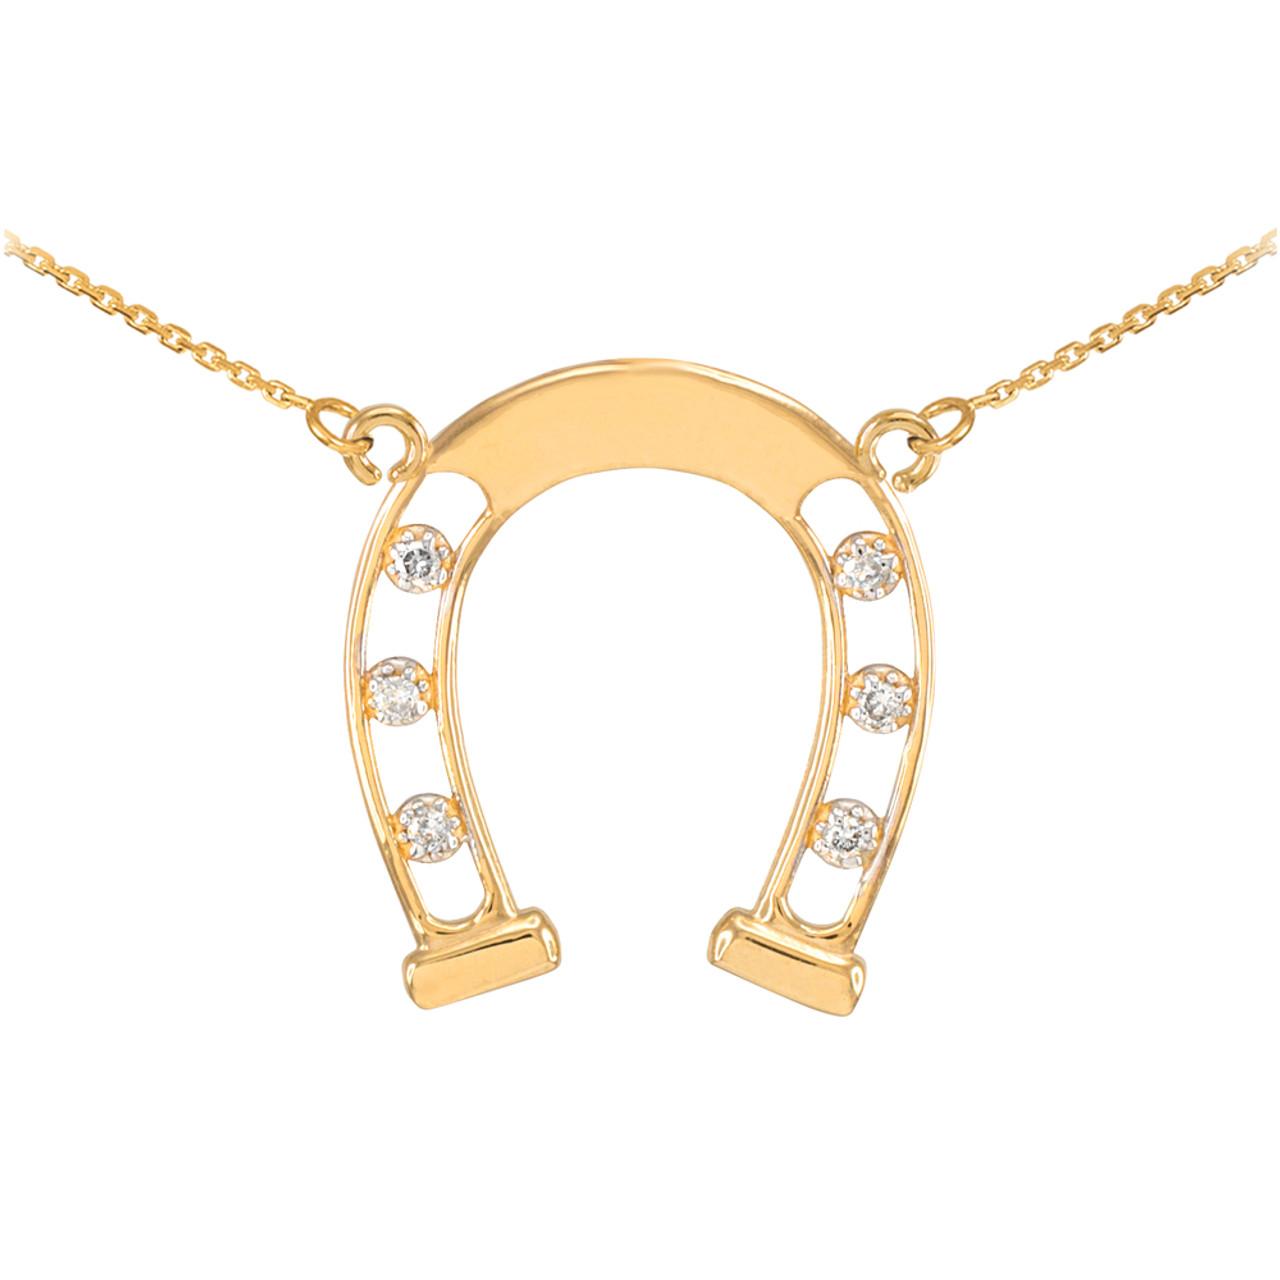 14k yellow gold good luck horseshoe diamond necklace gold lucky 14k gold good luck horseshoe necklace with diamonds aloadofball Choice Image